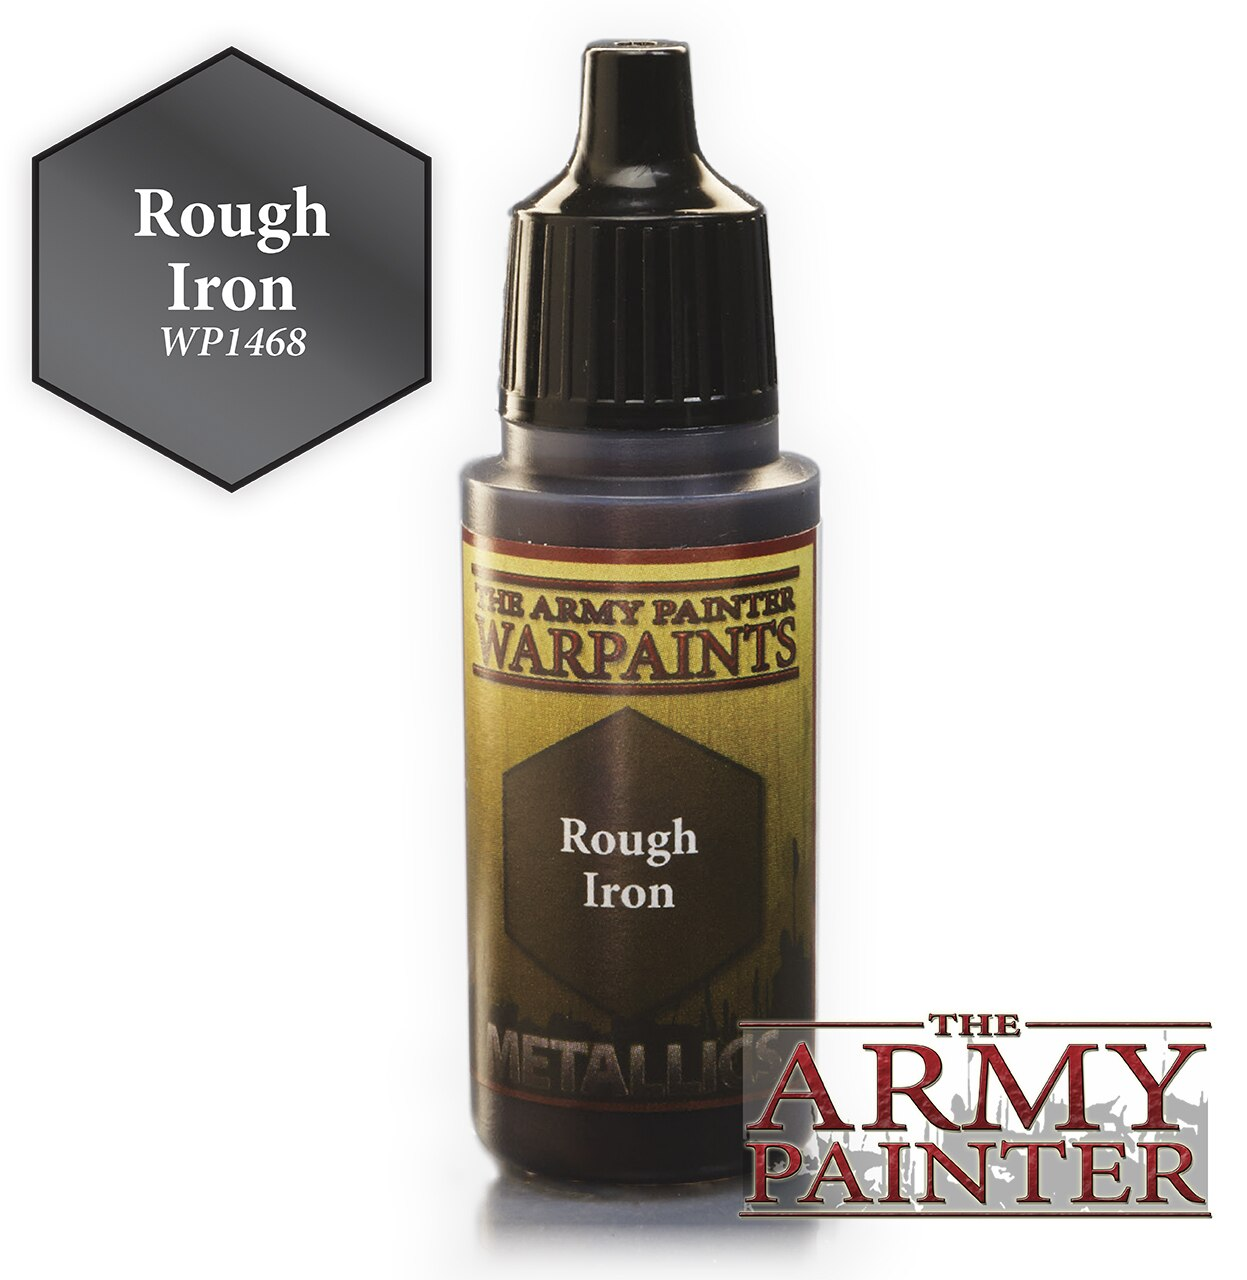 Army Painter Warpaint - Rough Iron